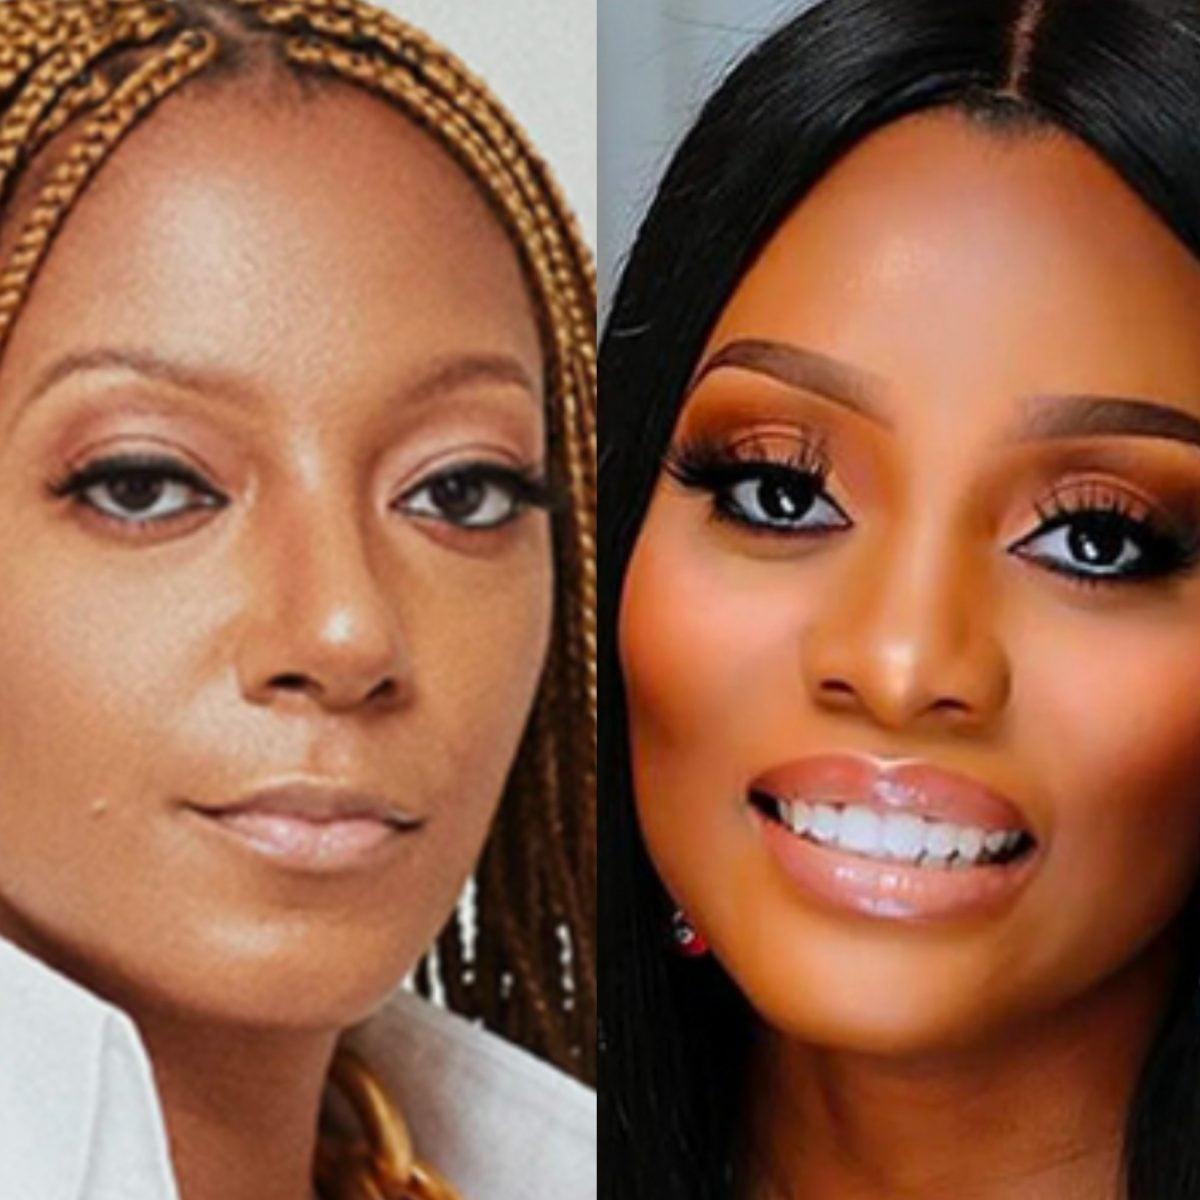 Black Women Designers From Nigeria, Ghana & America Share Keys To Entrepreneurial Longevity